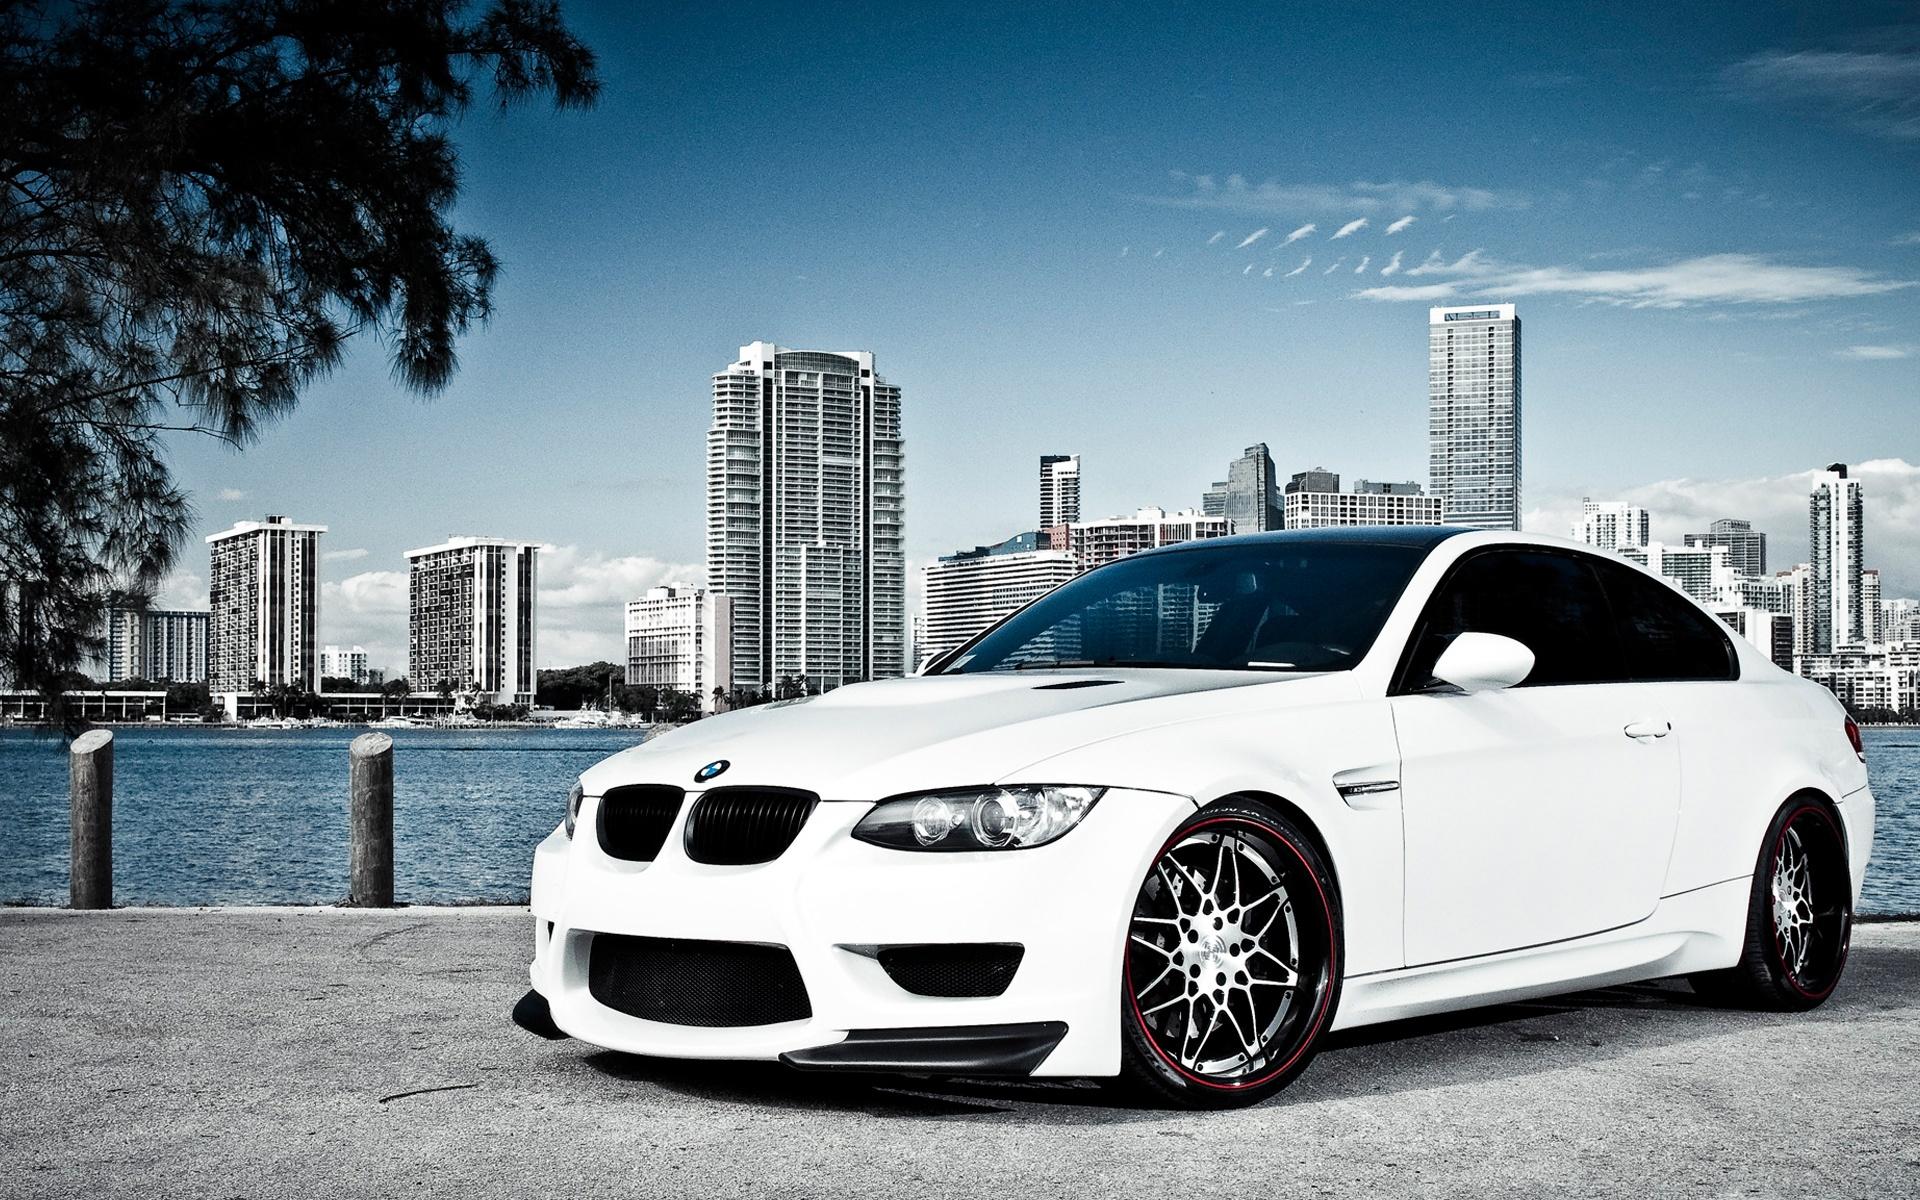 Description: Download White BMW M3 Over Miami Car Wallpaper | White BMW M3 Over Miami 1920x1200 Resolution HD Widescreen Desktop Background & Stock Photo.